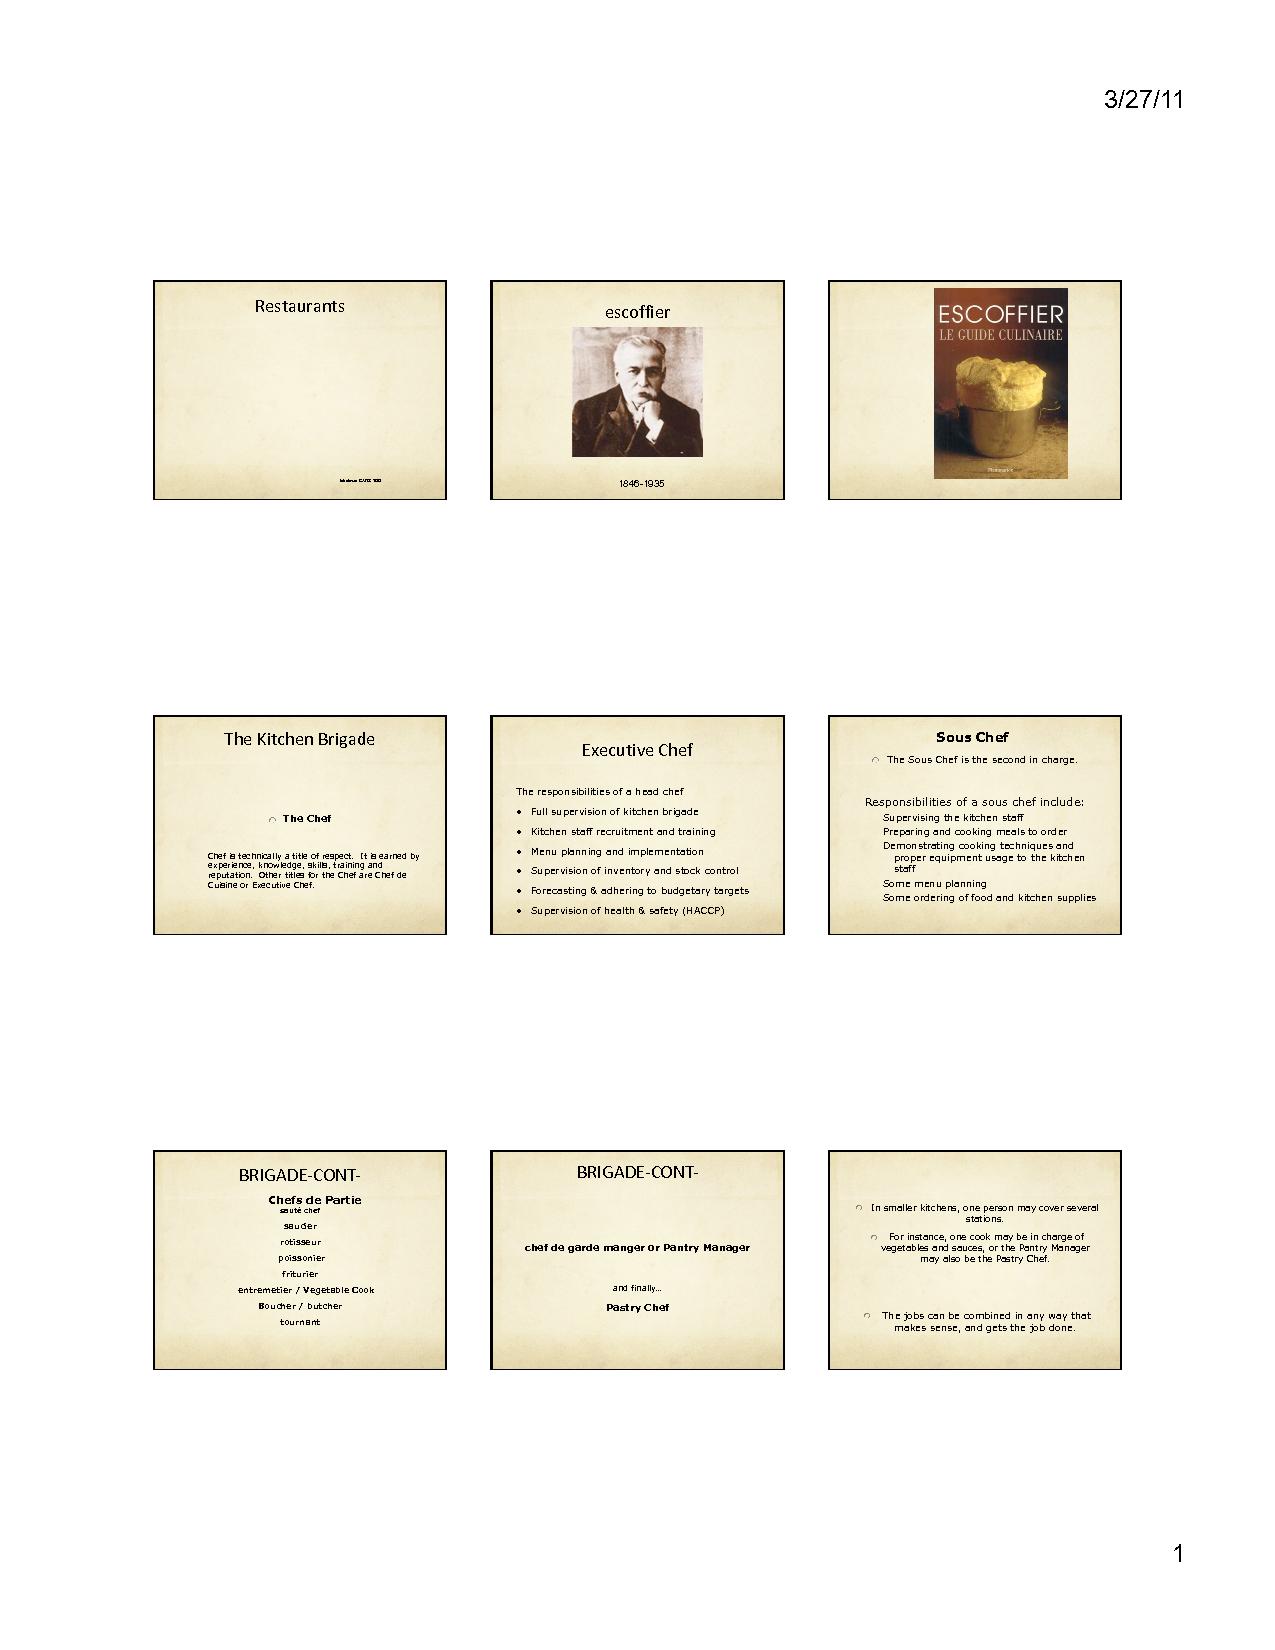 chef brigade chart - Google Search | Auguste Escoffier, Legend ...